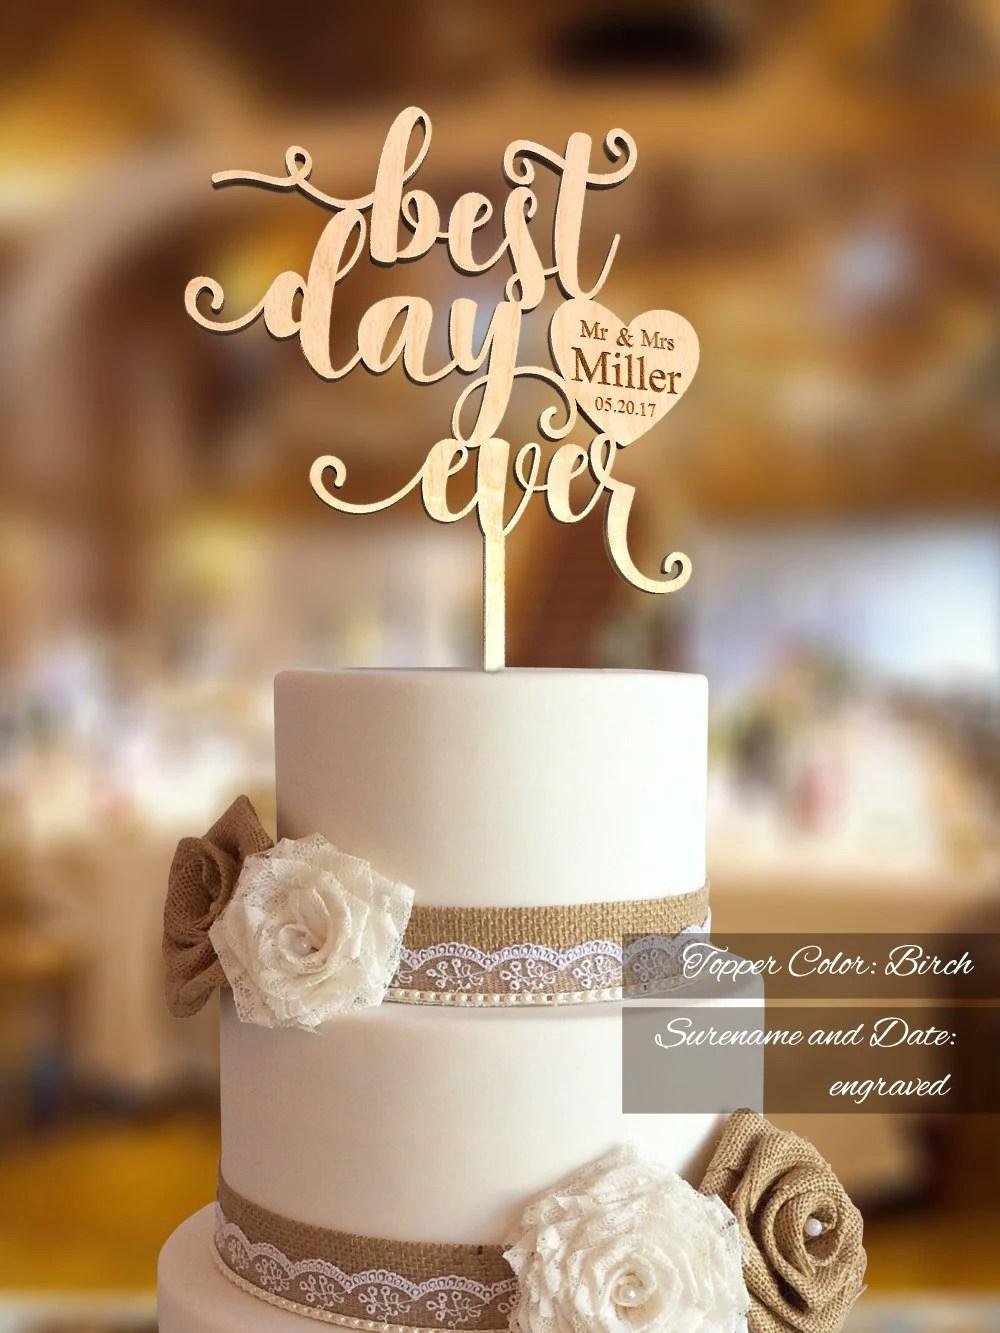 Best Day Ever Wedding Cake Topper Wedding Cake Topper FN30